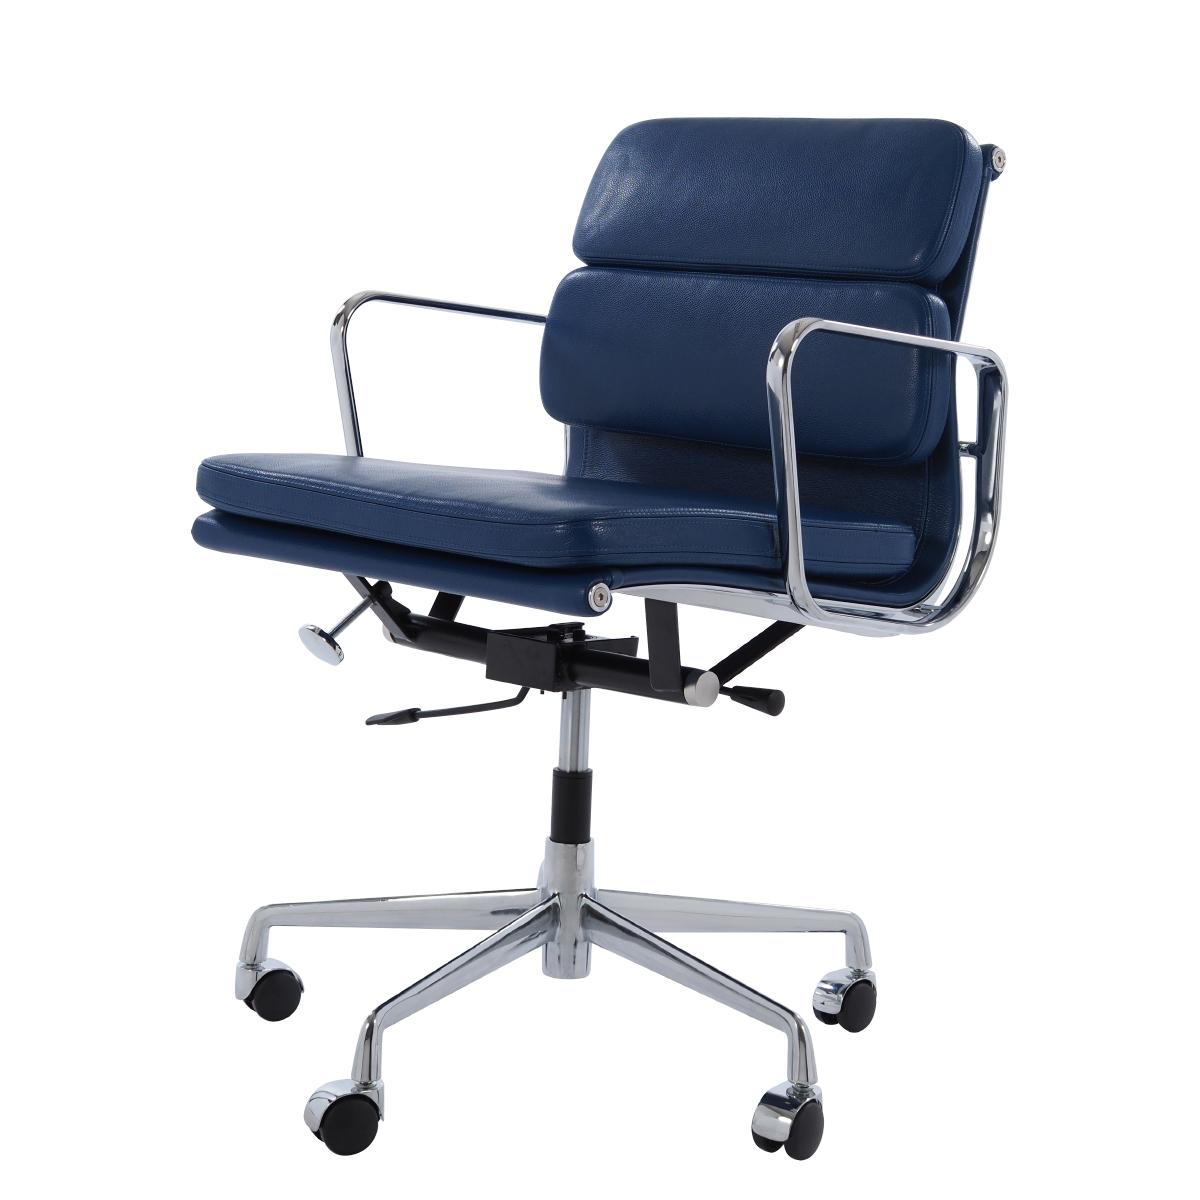 Charles Eames sedia da ufficio. EA217. Design sedia da ...